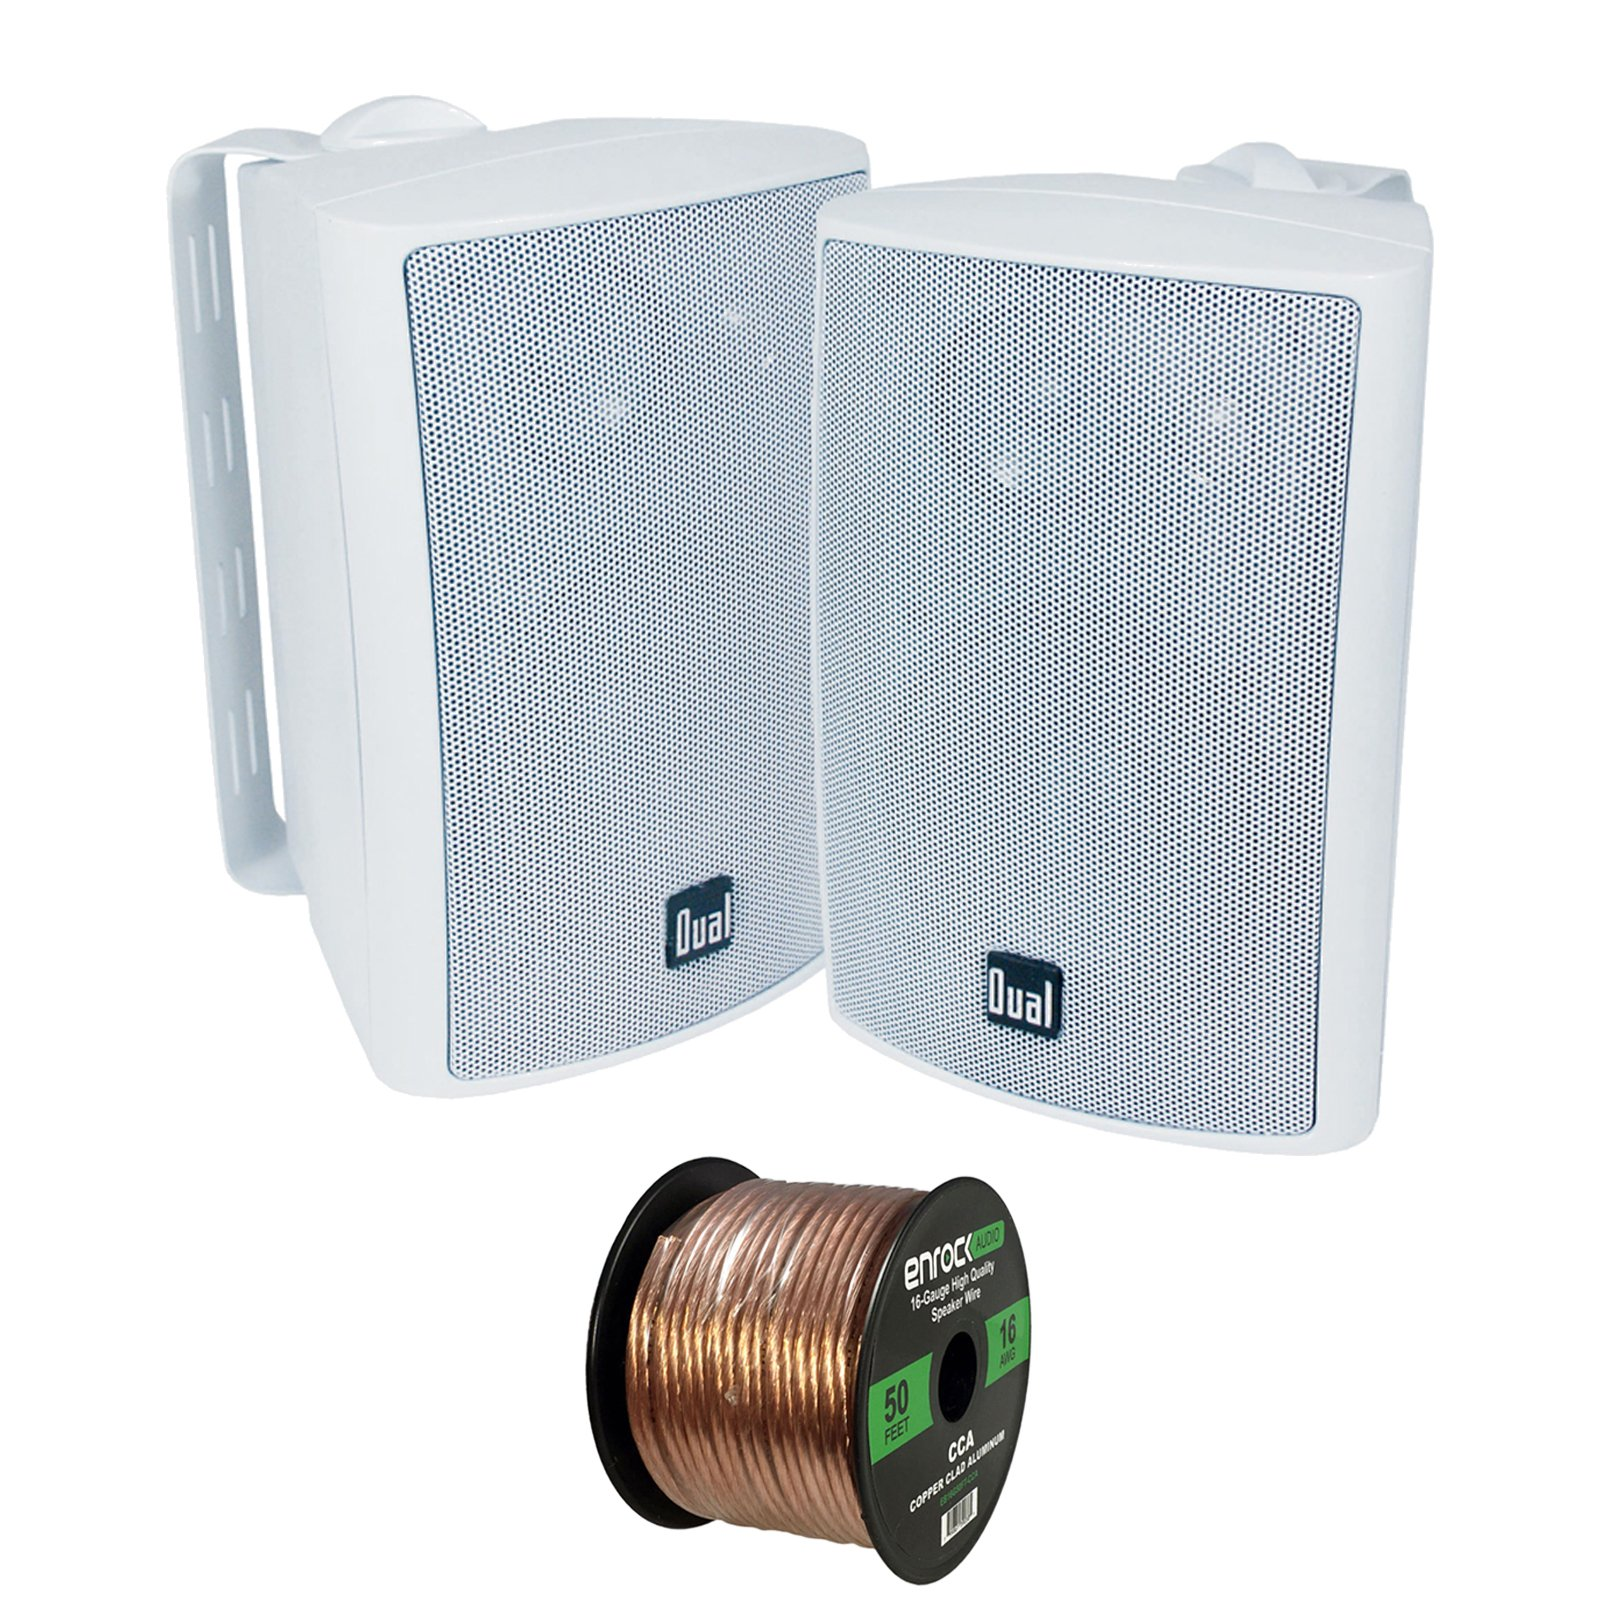 2X Dual Electronics LU47PW 4 Inch 100-Watt 3-Way Indoor/Outdoor High Performance Bookshelf Studio Monitor White Speakers w/Swivel Brackets, Enrock 16-G 50 Ft Audio Speaker Wire